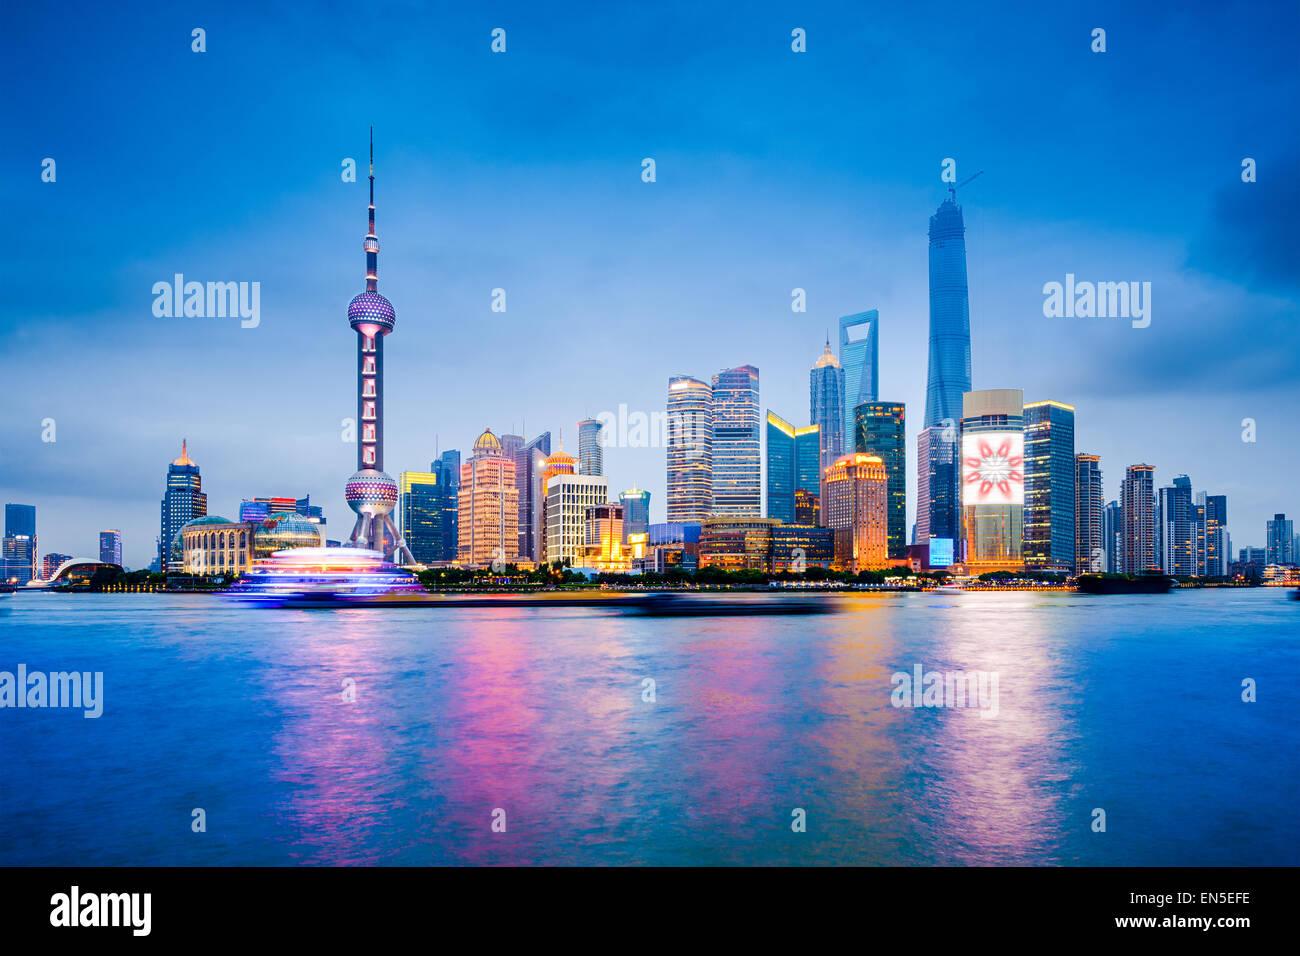 Shanghai, China financial district skyline on the Huangpu River. - Stock Image